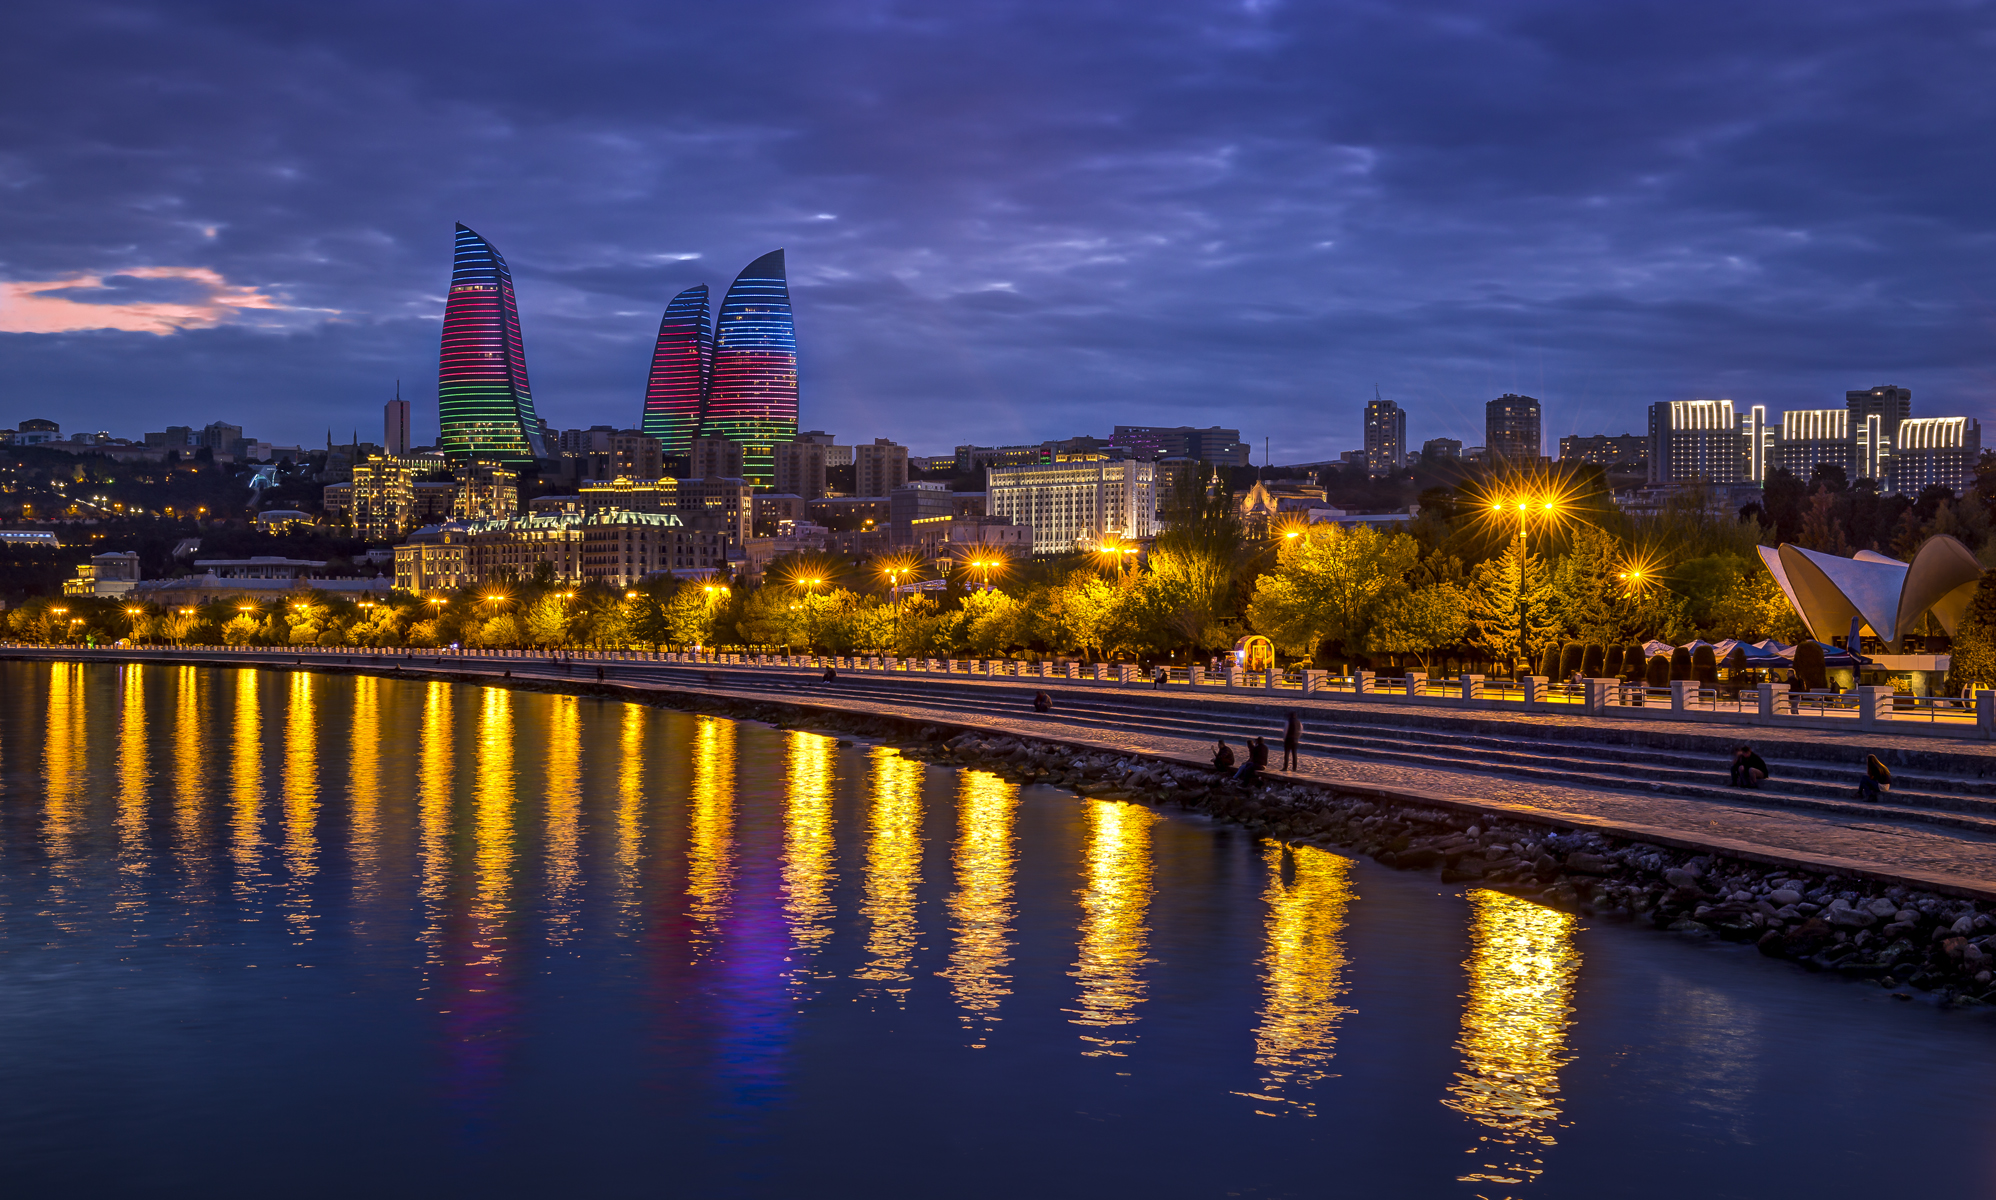 Flame towers, Azerbaijan